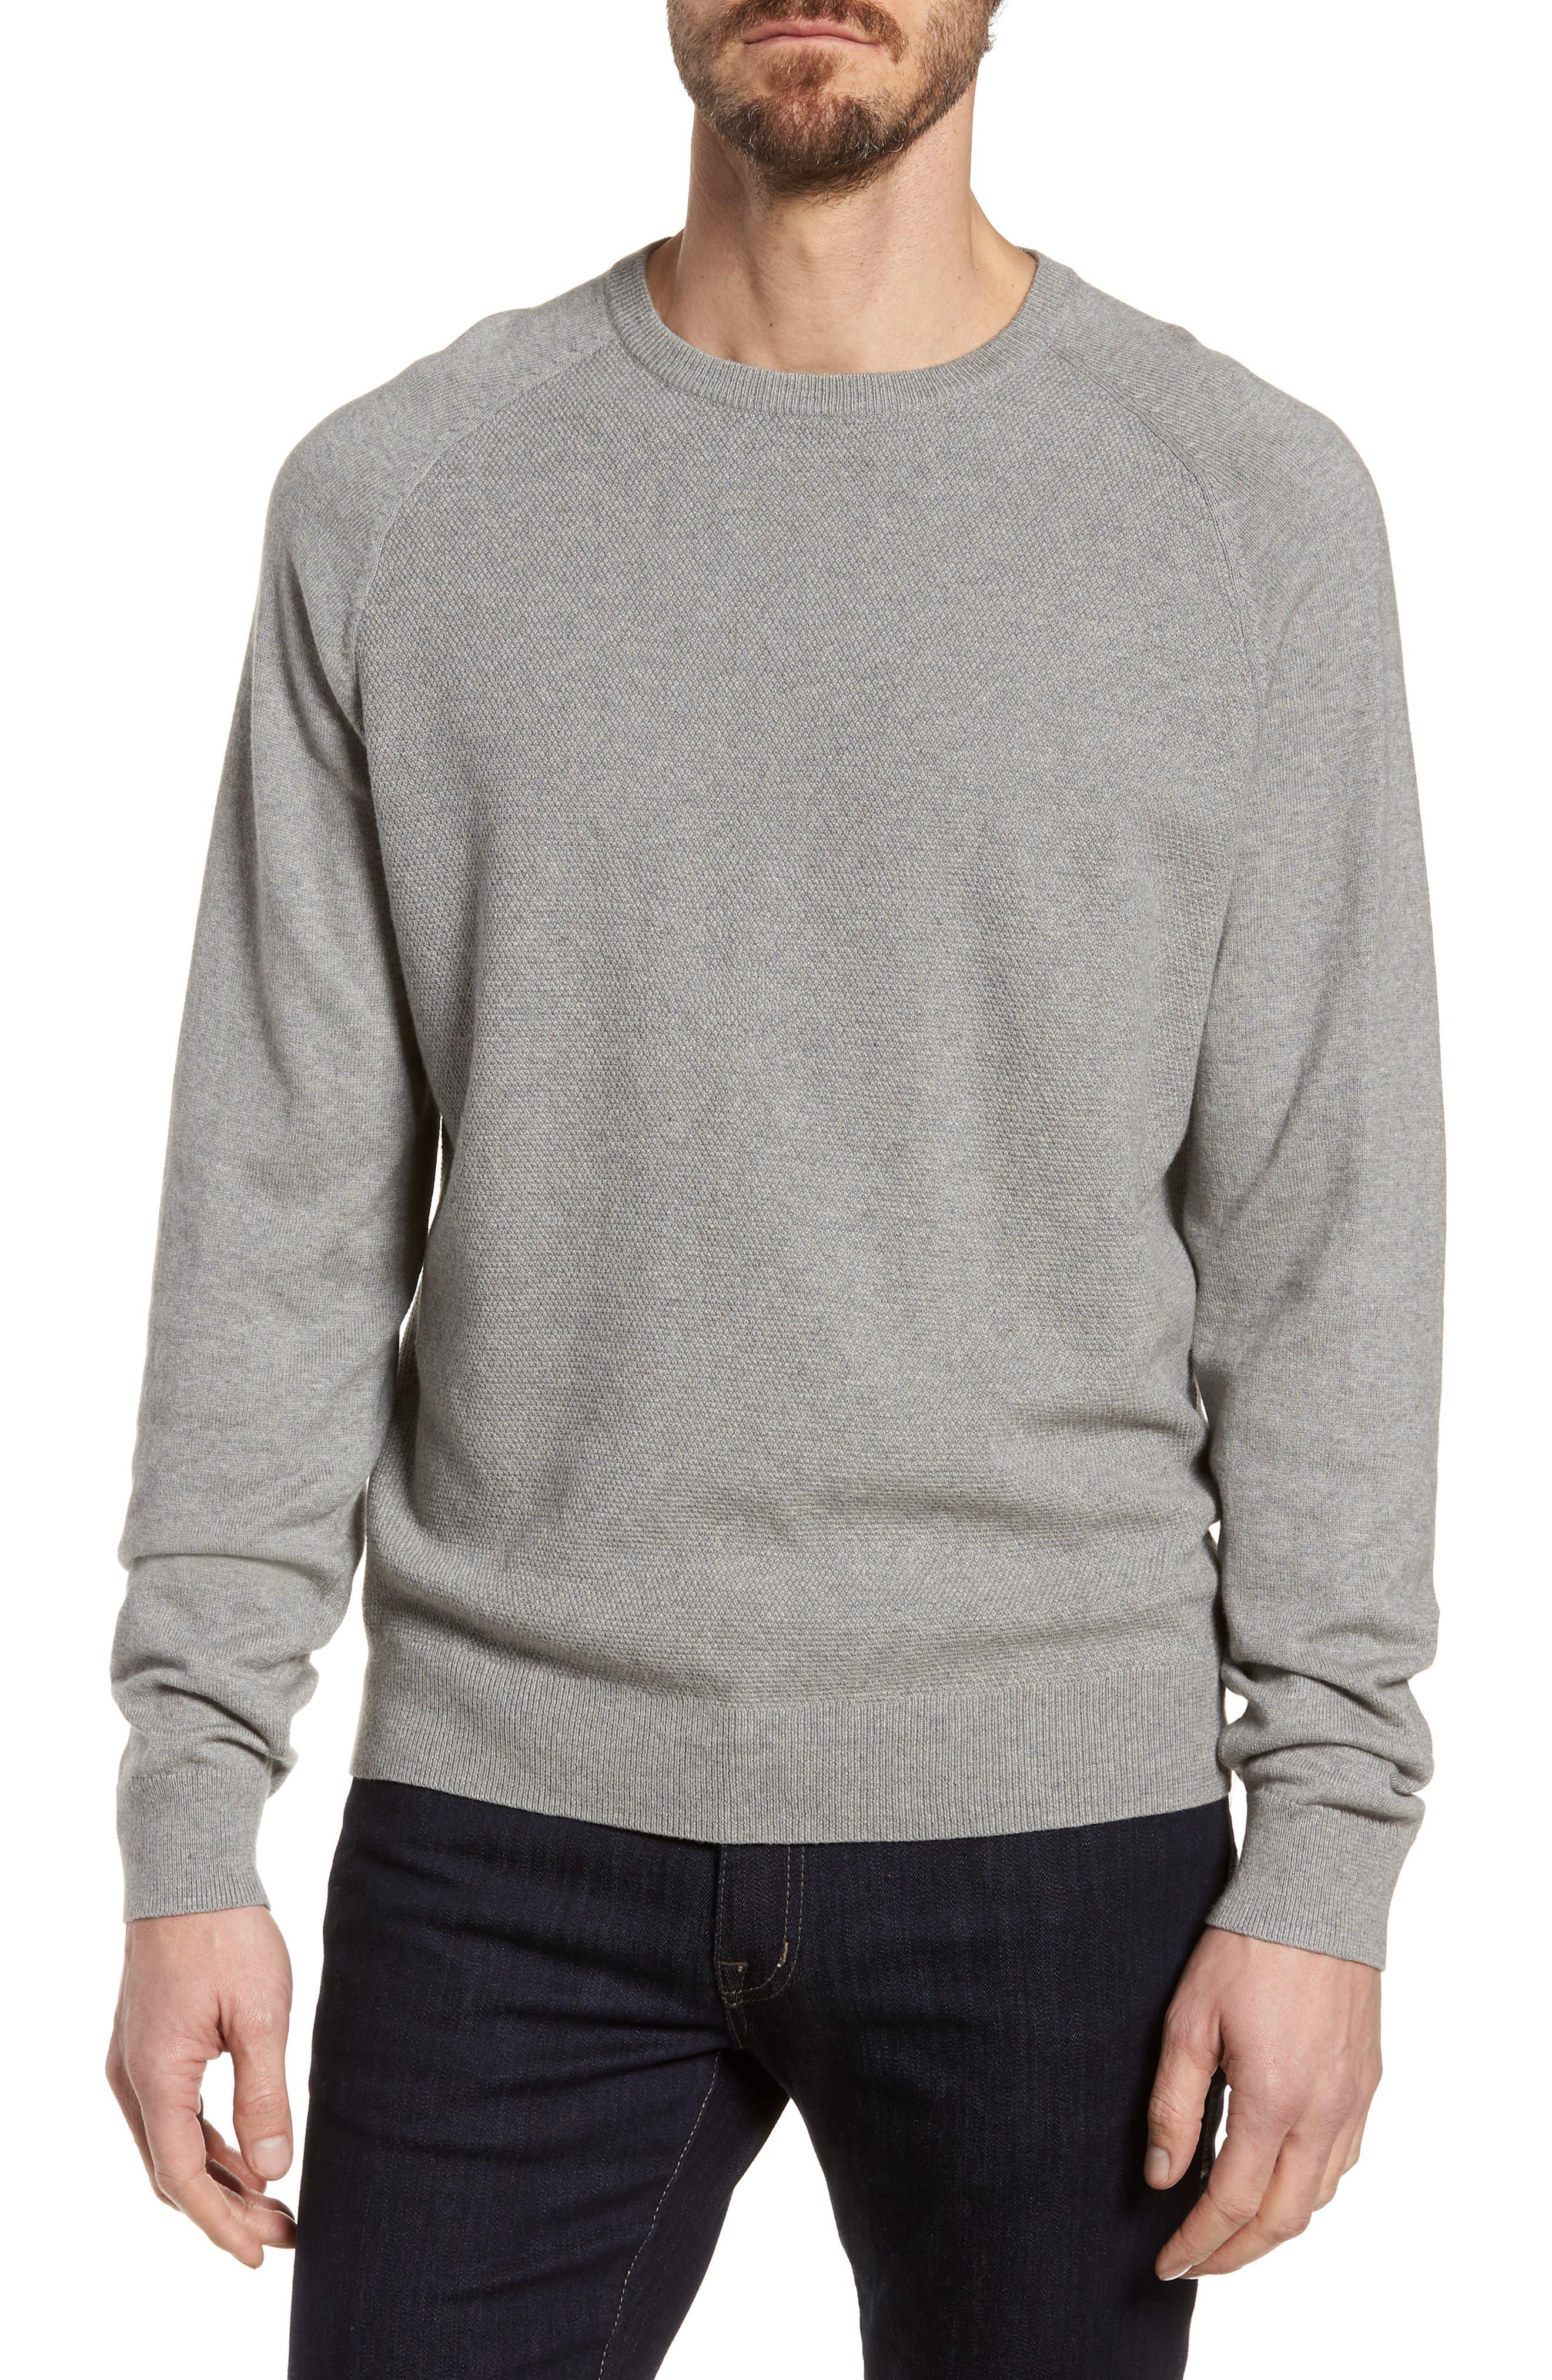 Crewneck Cotton & Cashmere Sweater,                         Main,                         color, 030